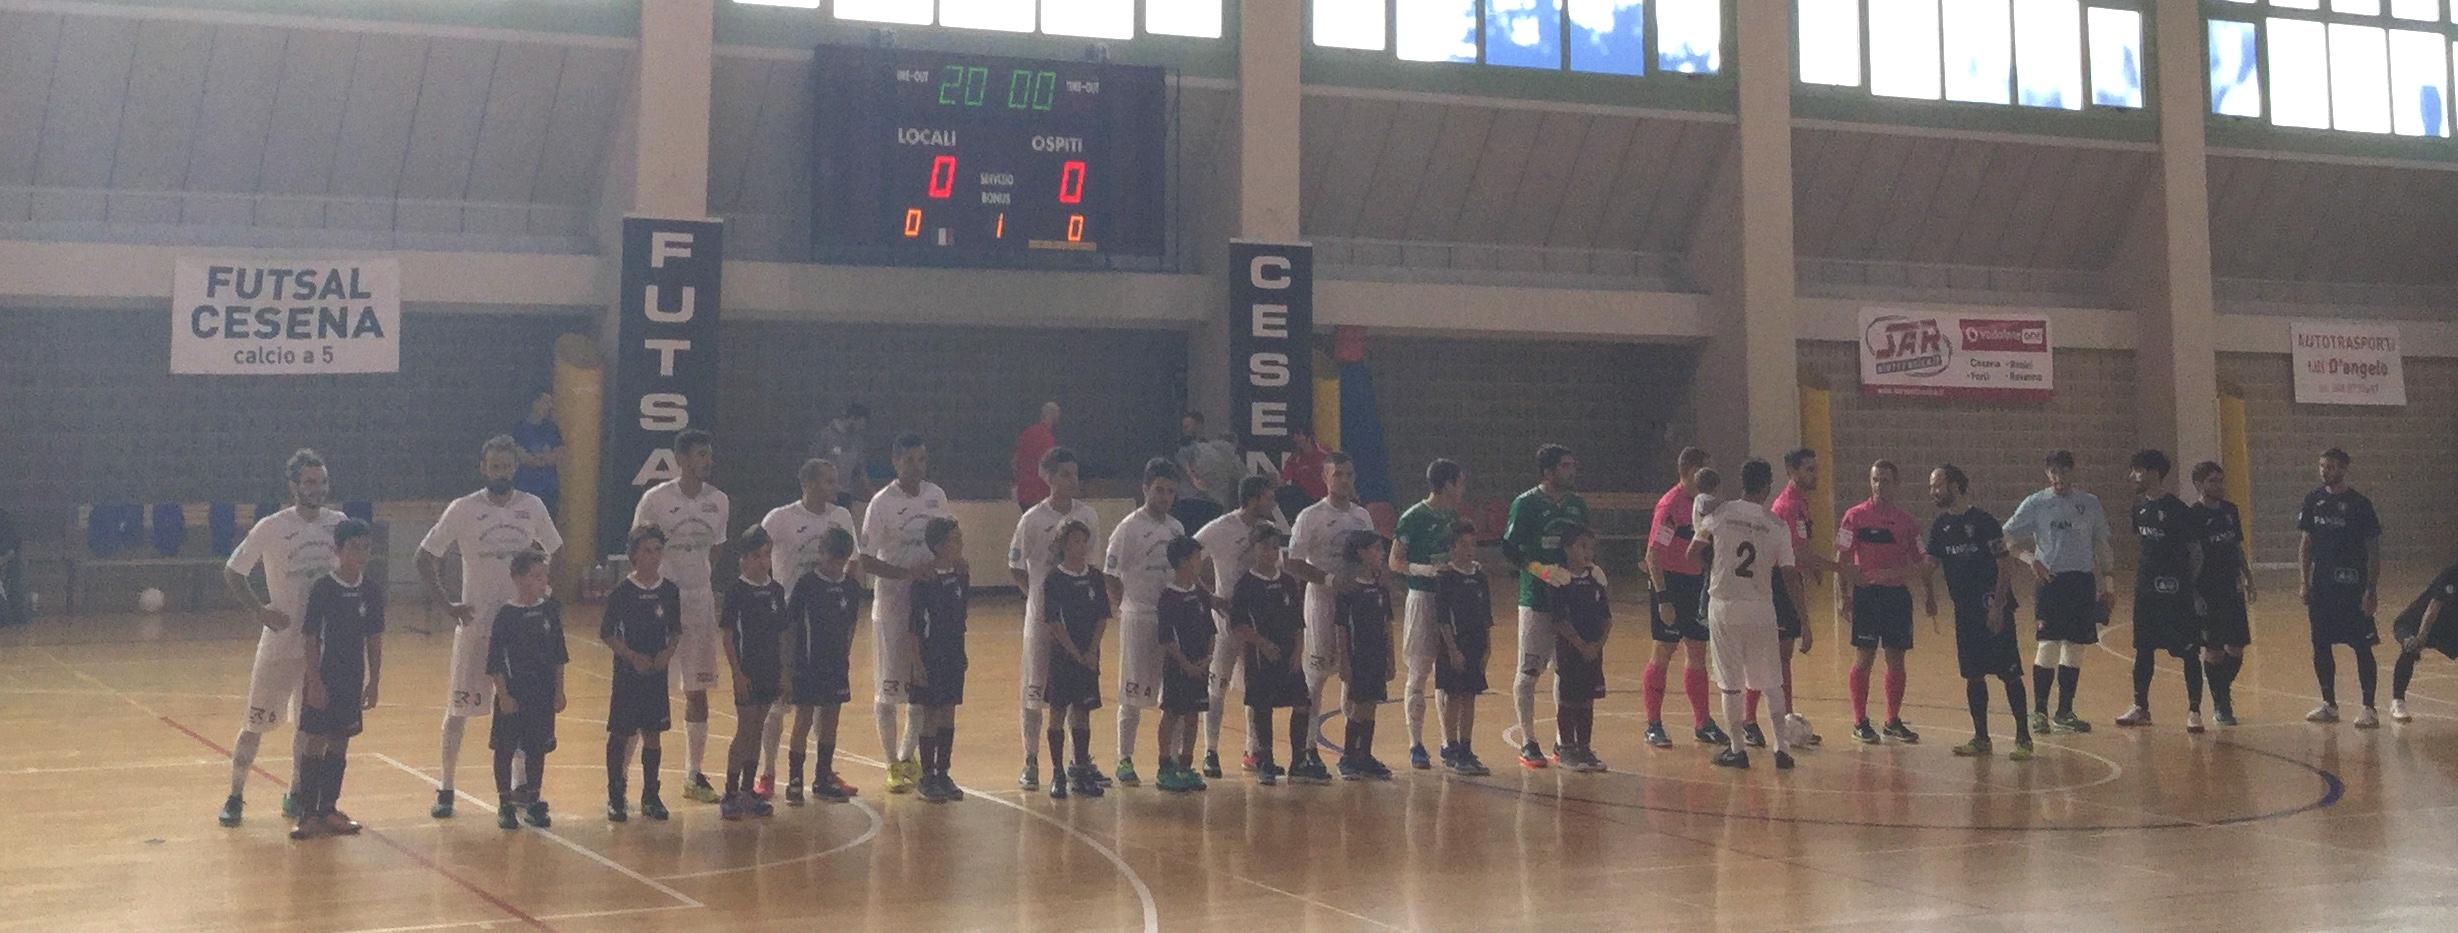 1a giornata: Futsal Cesena-Corinaldo 6-1